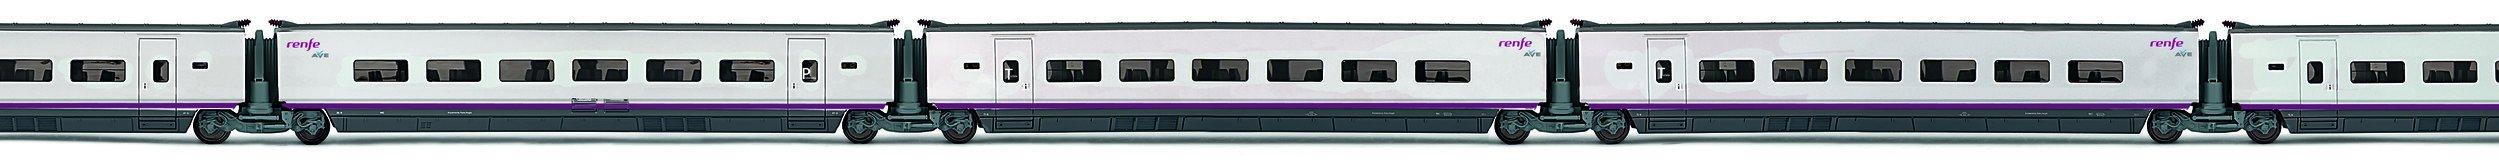 Electro Tren EL3521-Model Railways-Set 3Cars Extra Ave 100RENFE Operadora